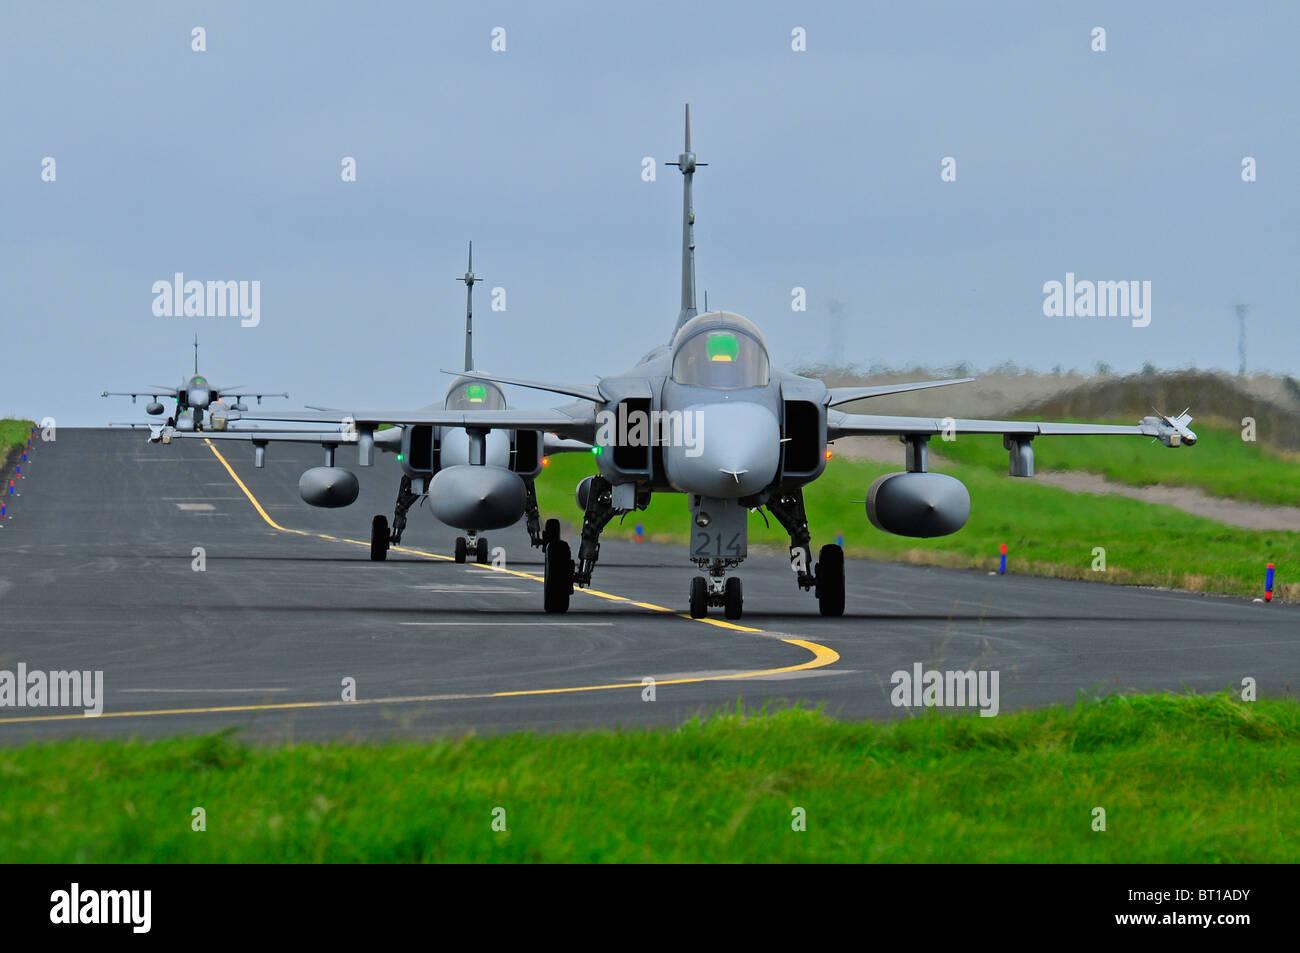 Saab JAS 39 Gripens single engined fast military Swedish jet fighter aircraft.  SCO 6851 Stock Photo